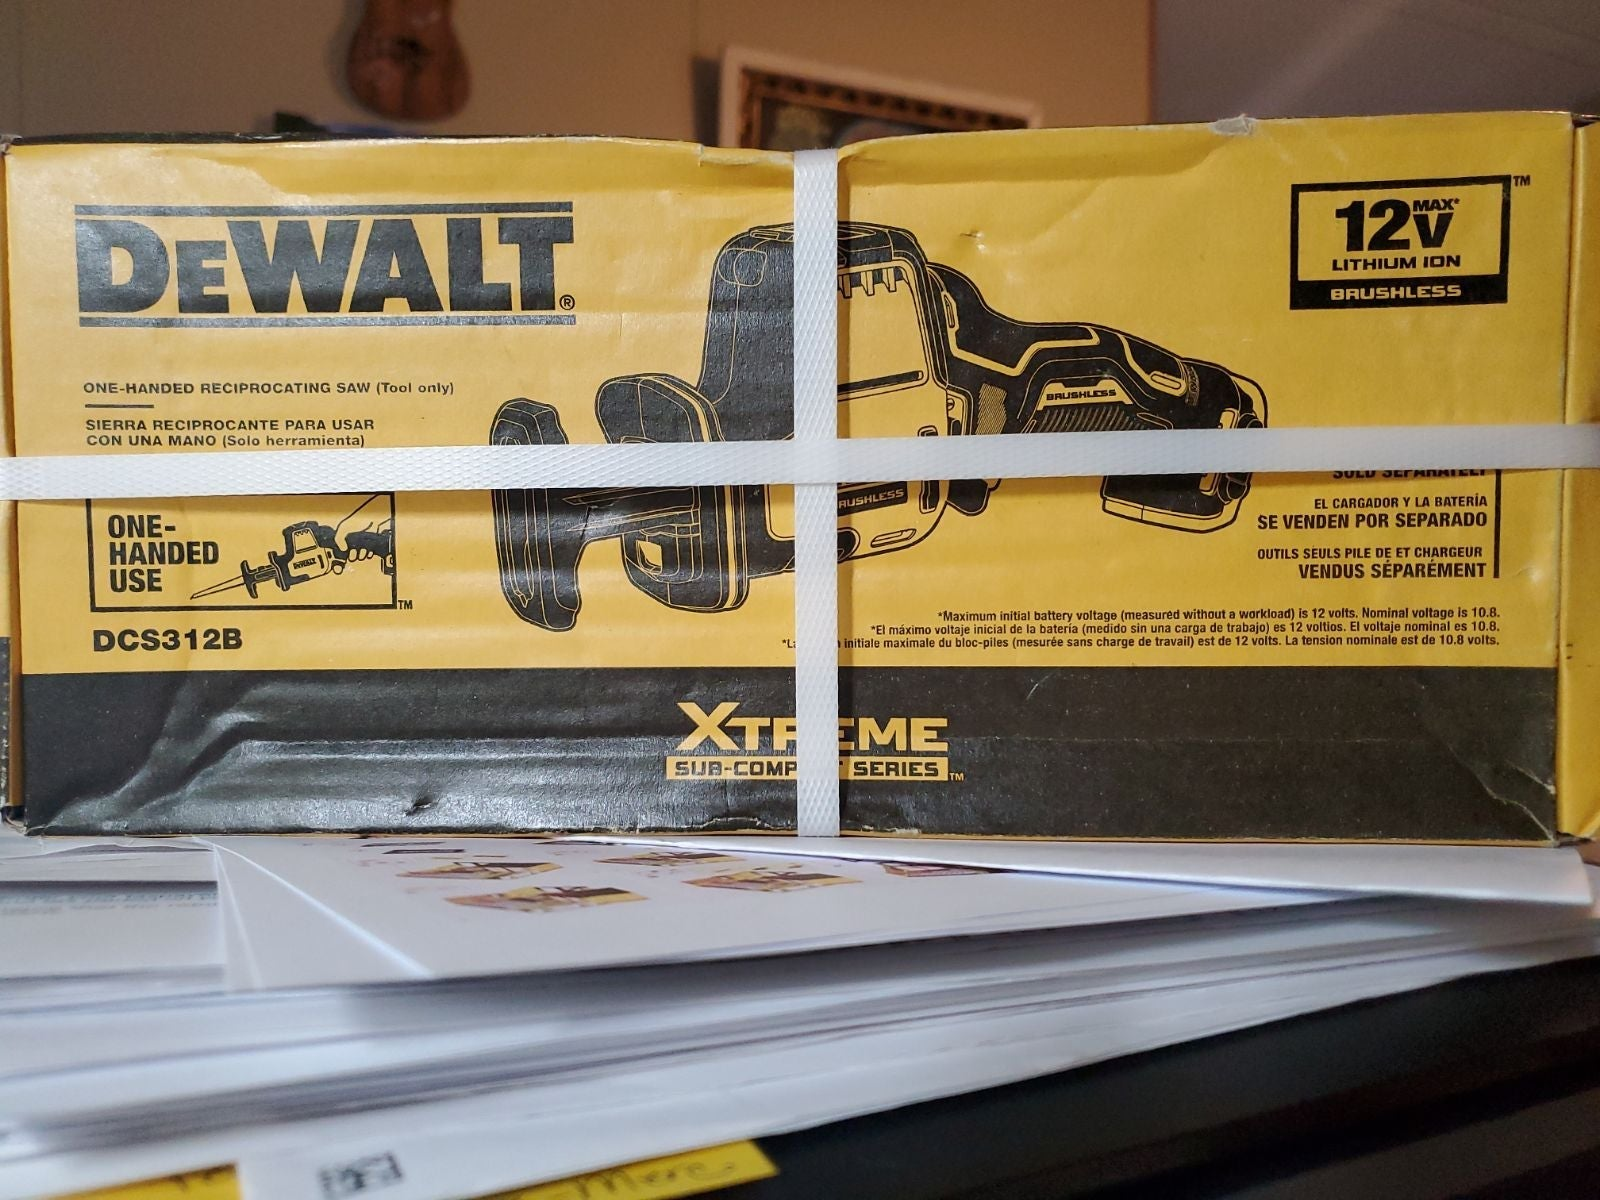 NEW Dewalt Reciprocating Saw DCS312B TOO